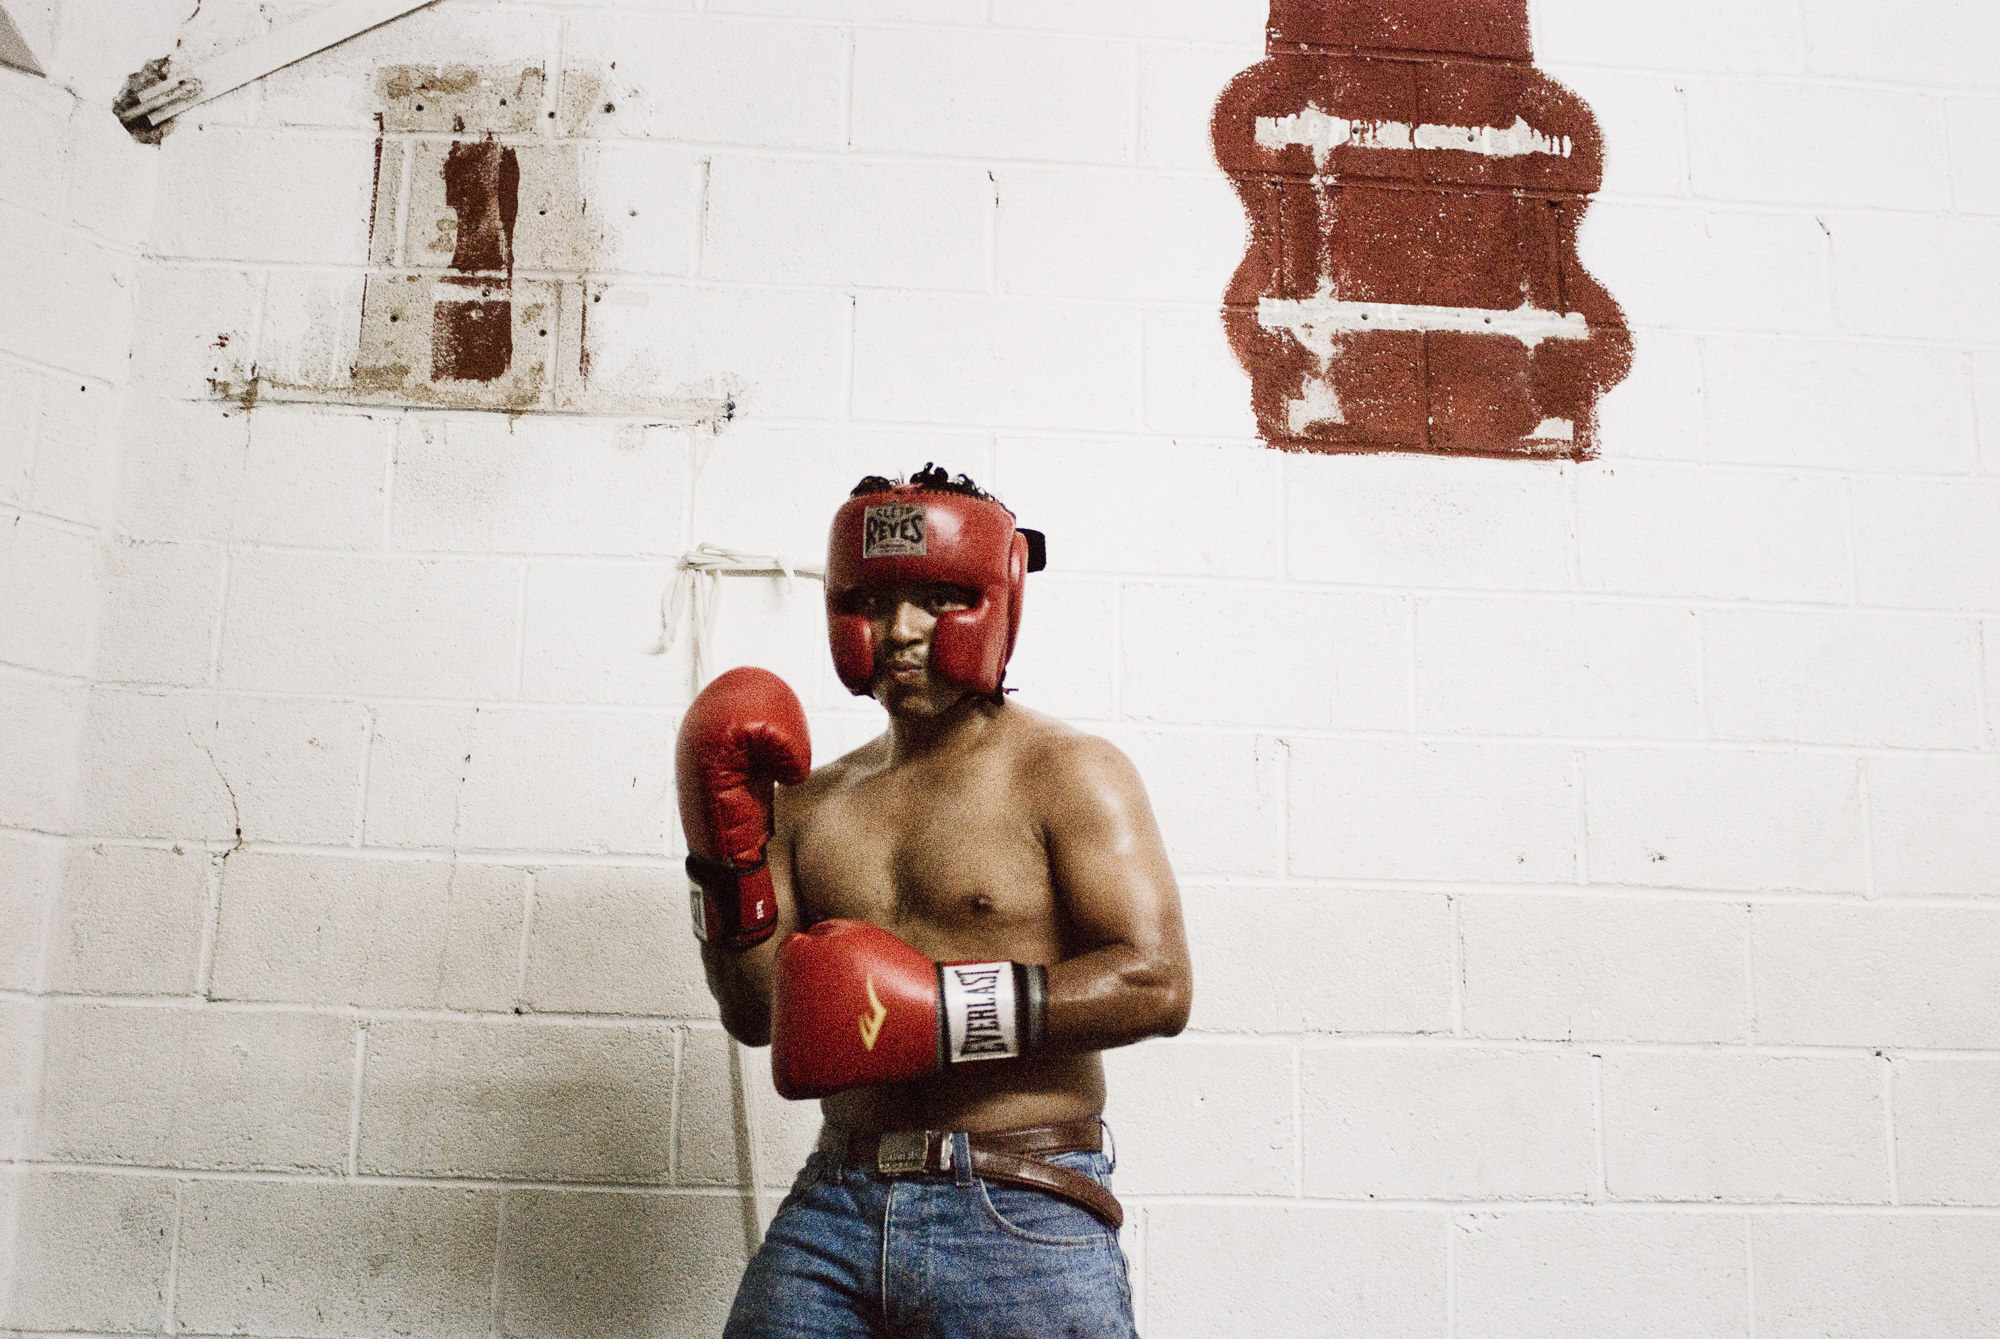 wojtek-jakubiec-photographer-montreal-boxing-mexico-documentary-boxer-warming-up.jpg